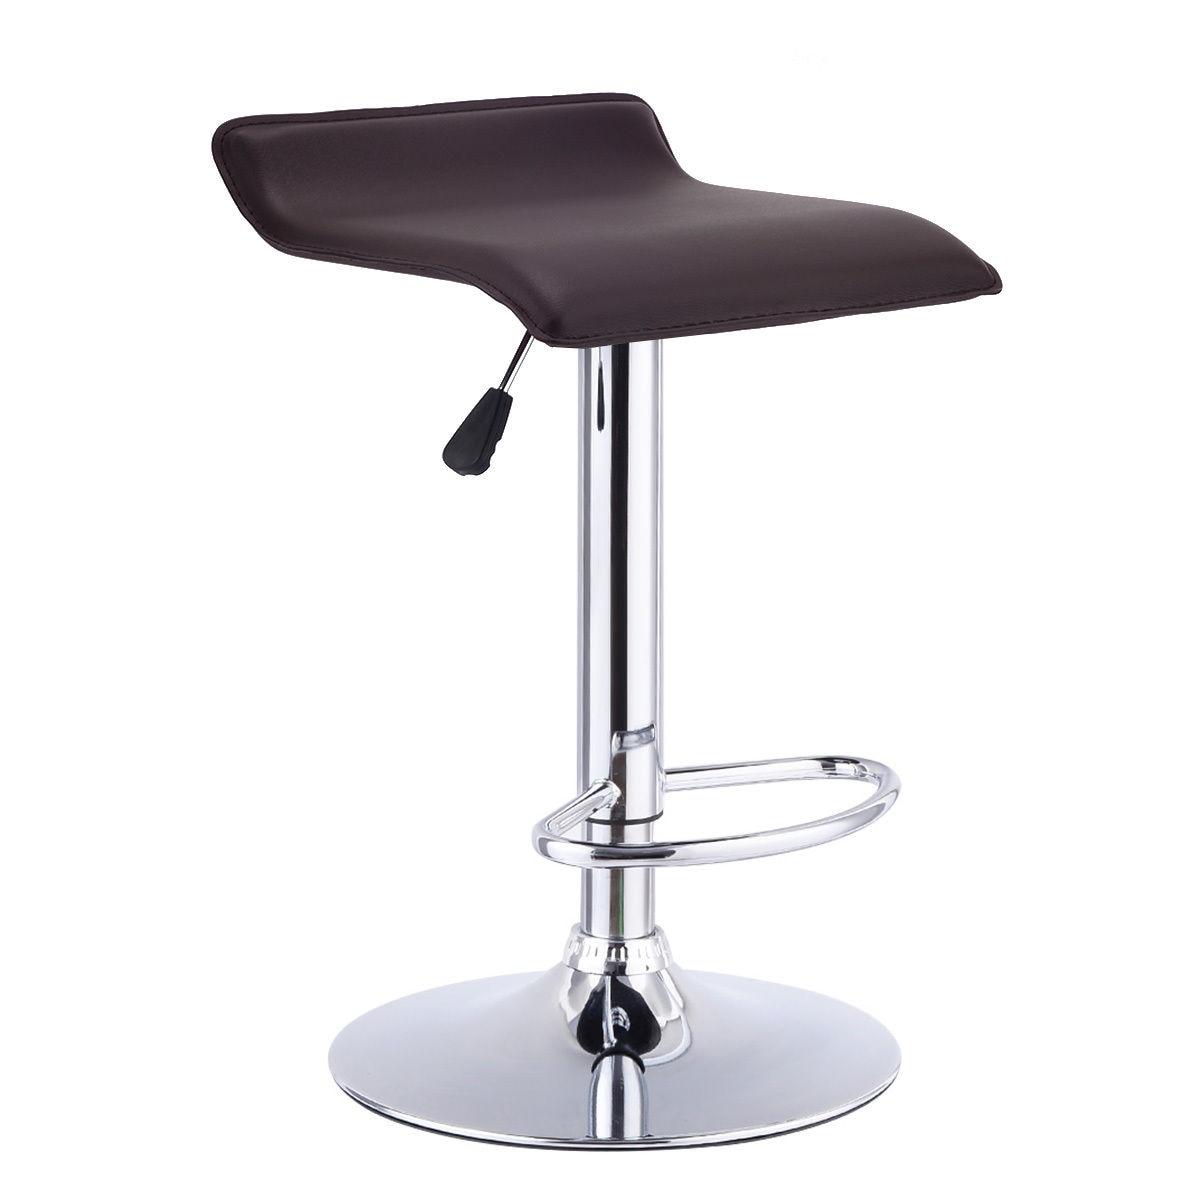 Giantex 1 PC Swivel Bar Stool Height Adjustable PU Leather Backless Dining Chair Modern Coffee Bar Chairs HW55711CF oem 6es7223 1bh22 0xa0 simatic s7 200 plc digital module 6es7 223 1bh22 0xa0 em223 8 di 8 do 24v dc 6es72231bh220xa0 free ship